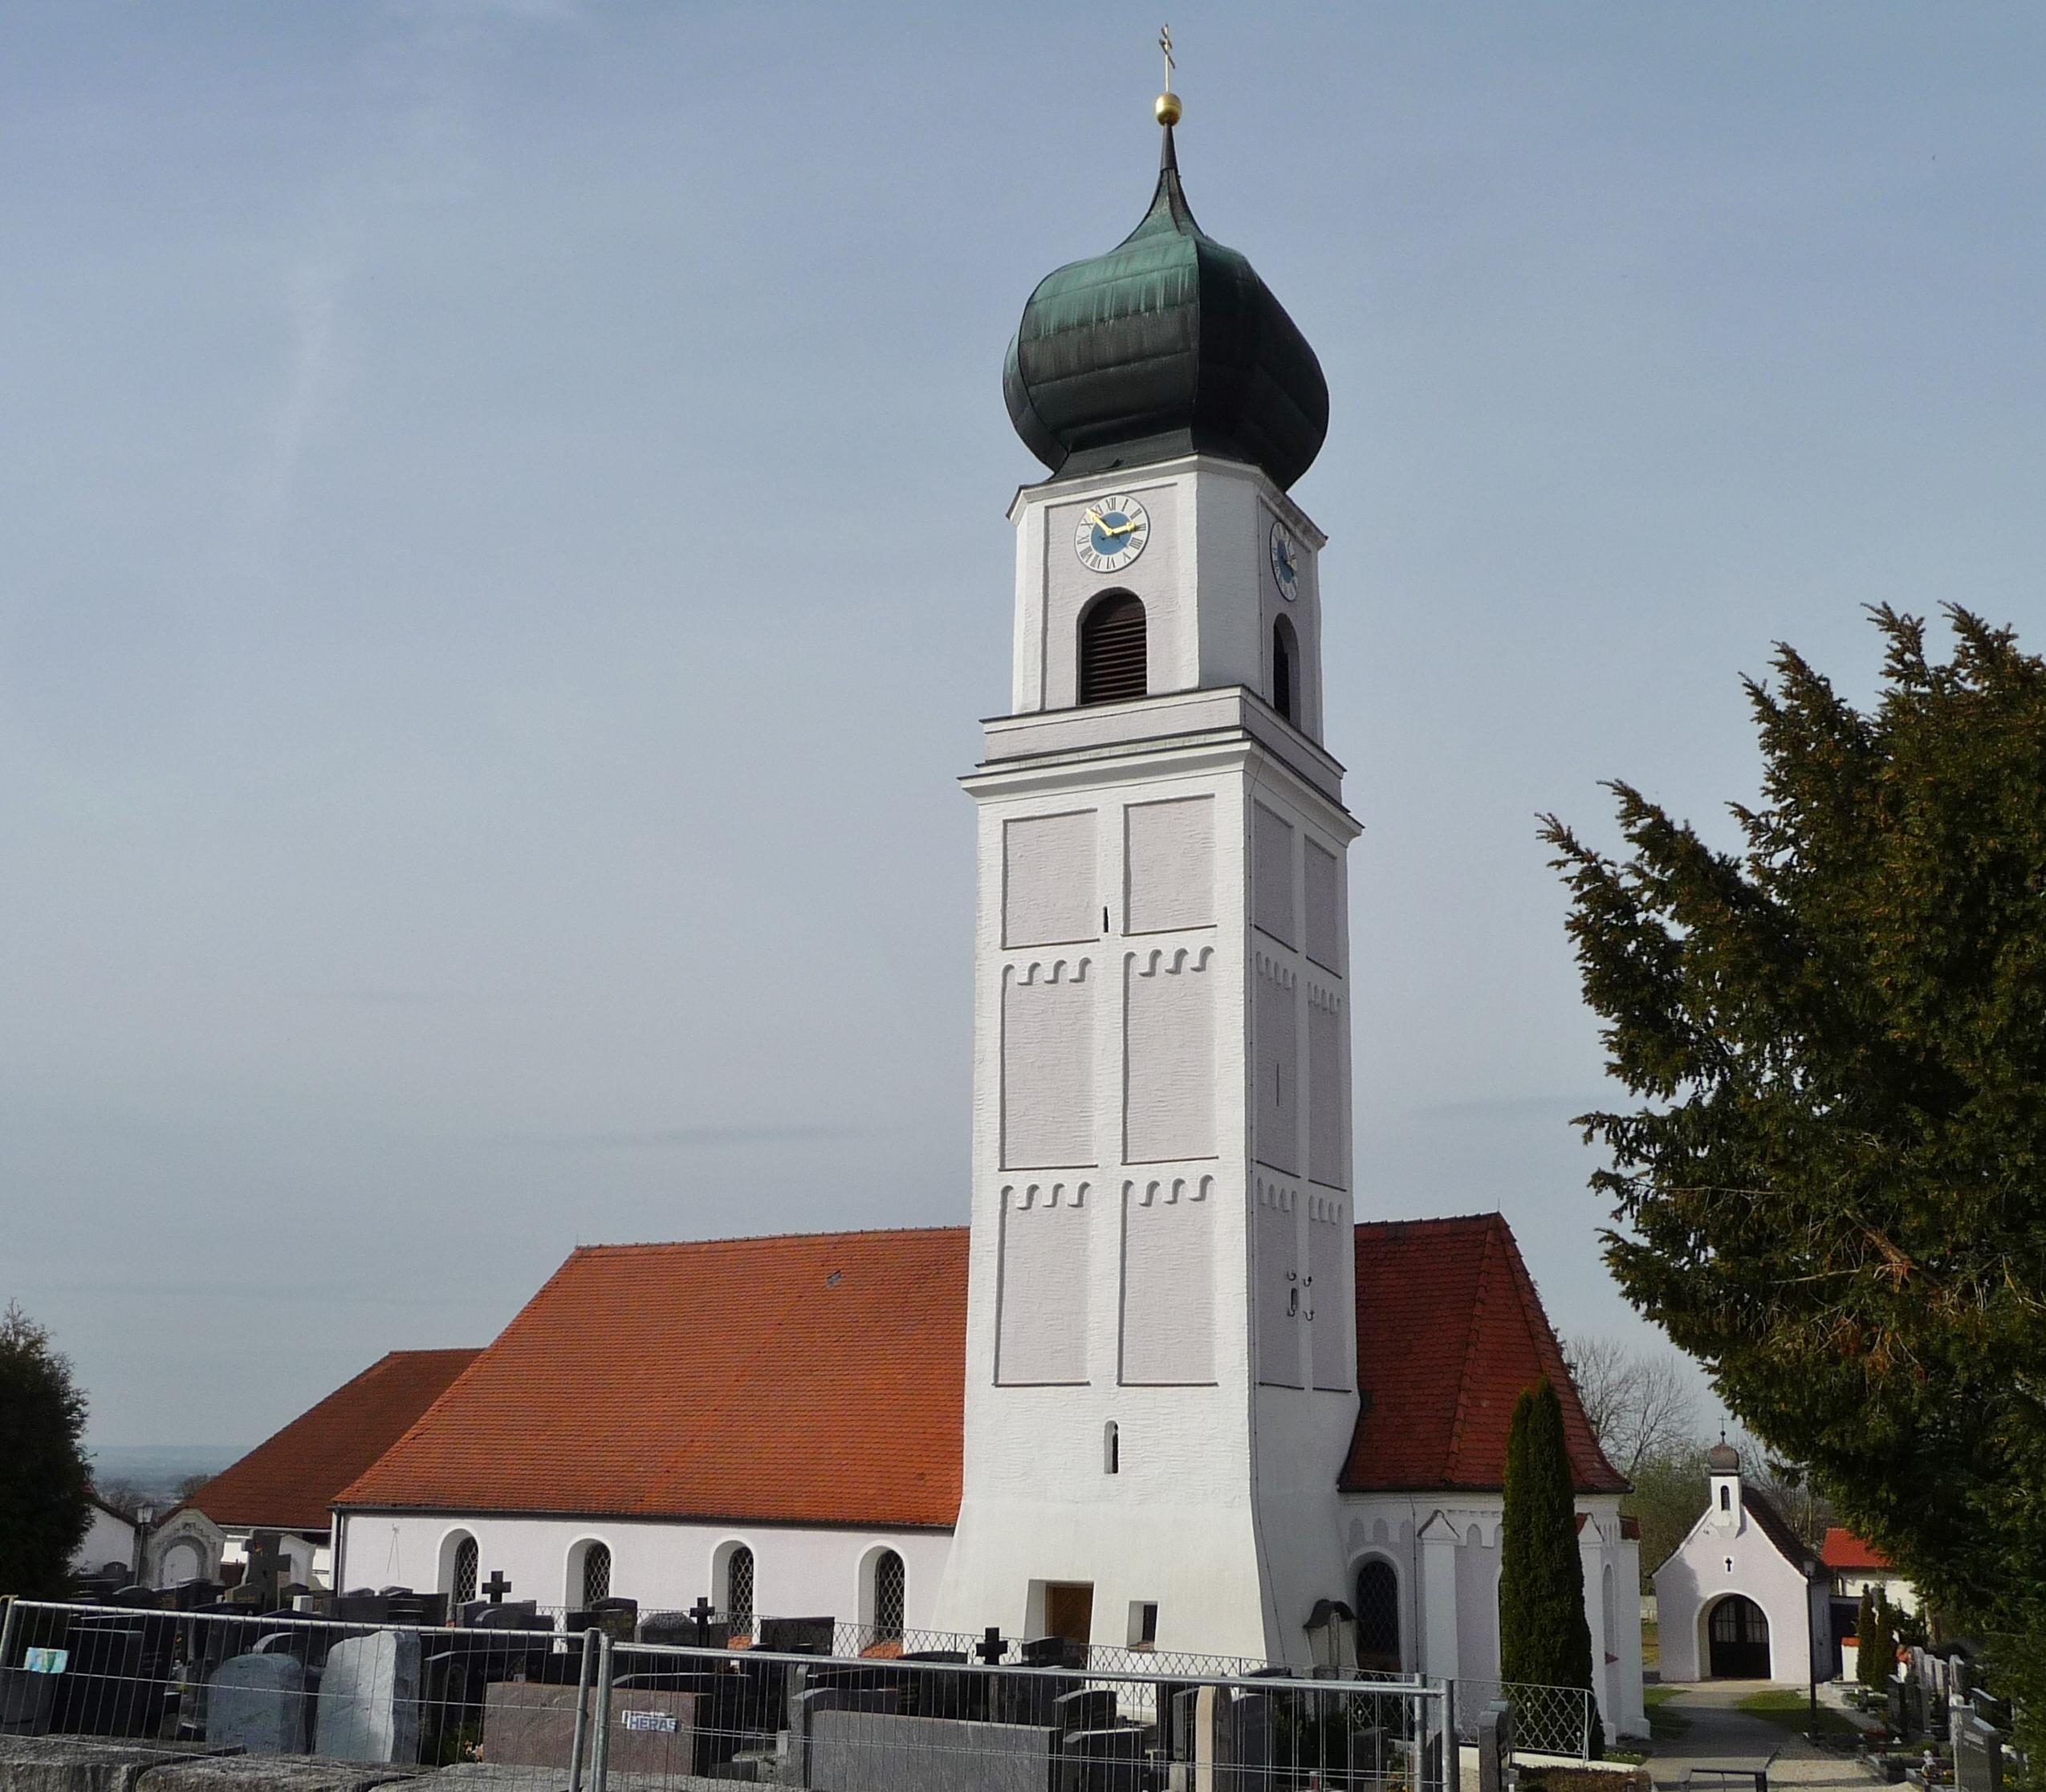 St Laurentius Zeholfing